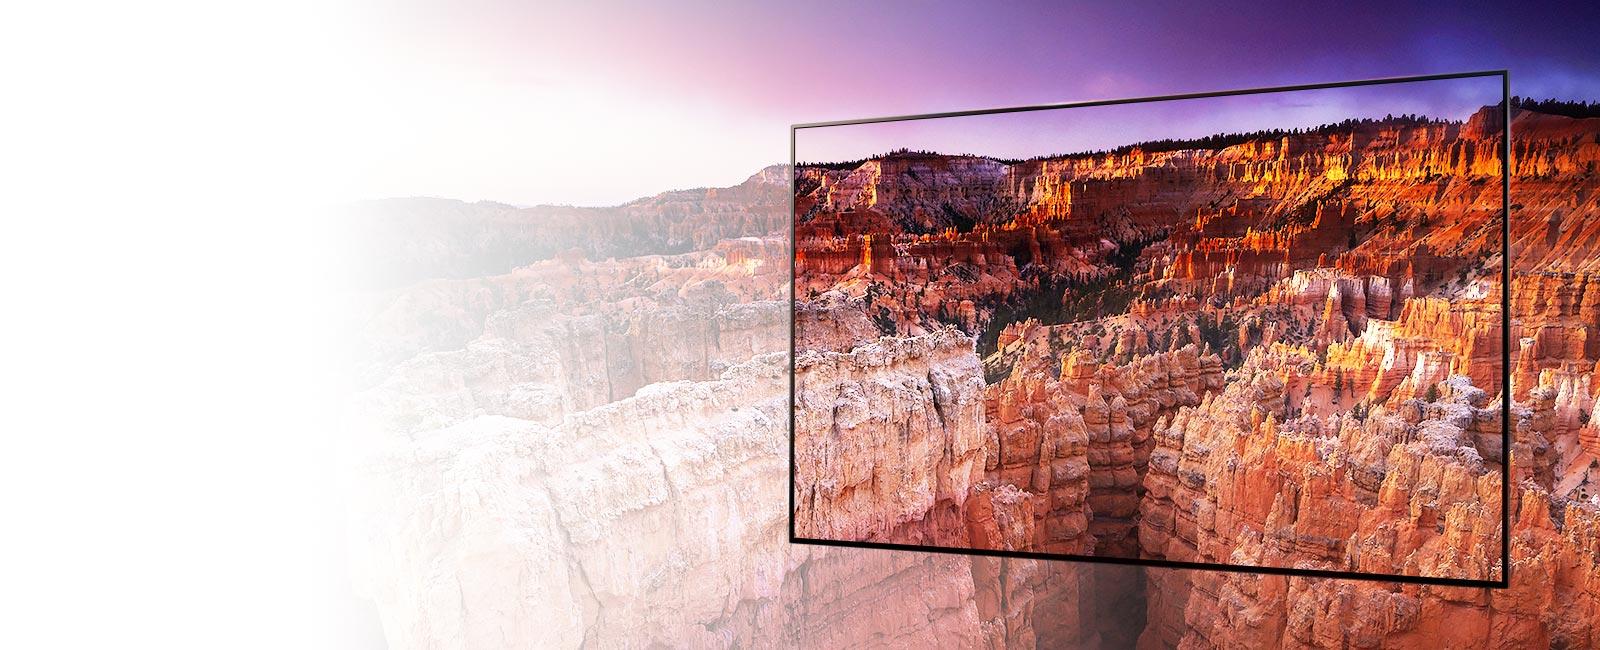 LG OLED55CXPTA Image Retention